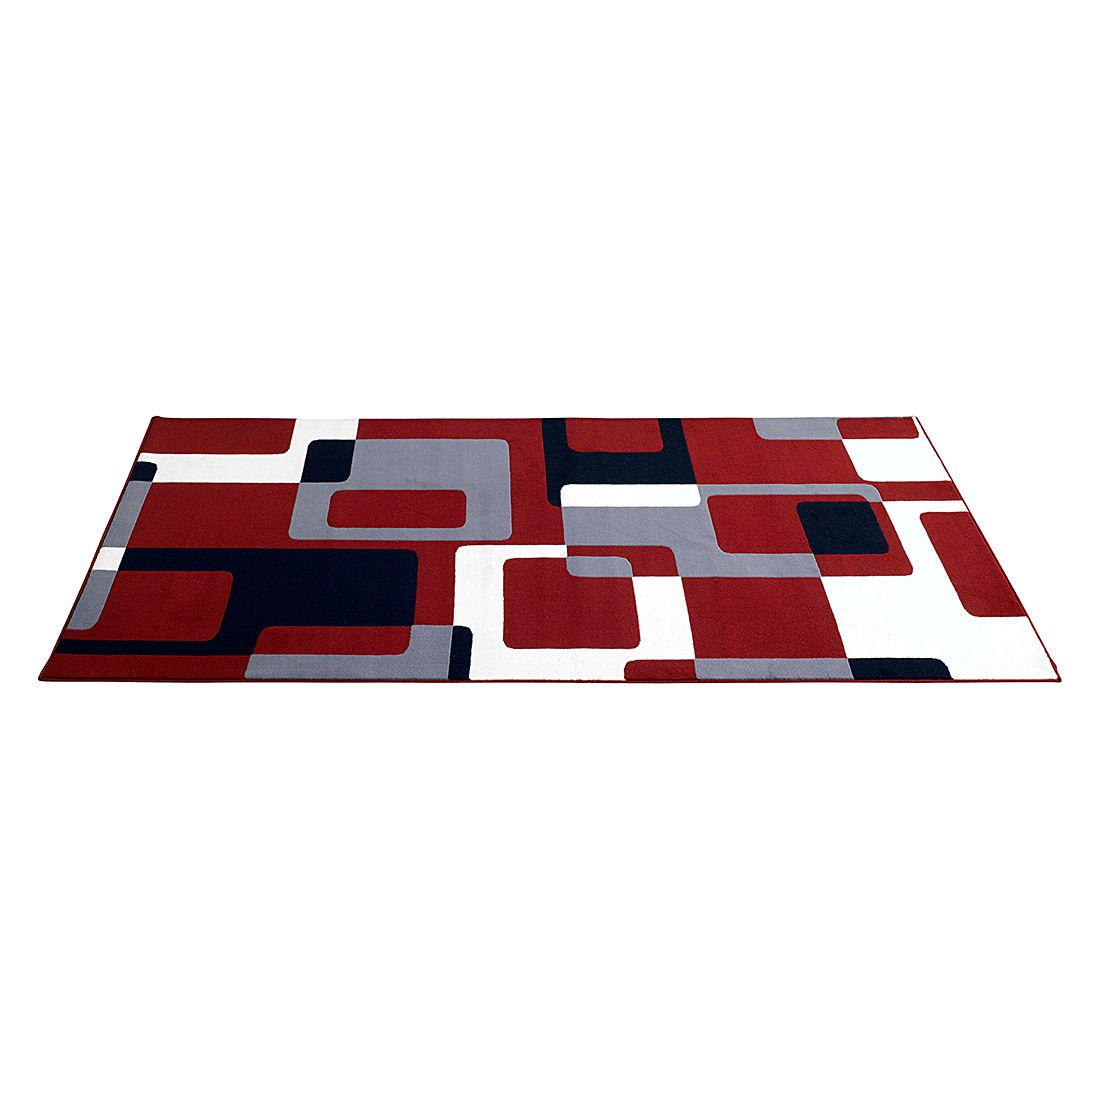 Tapijt Retro - 120x170cm - Rood/zwart/grijs, Hanse Home Collection